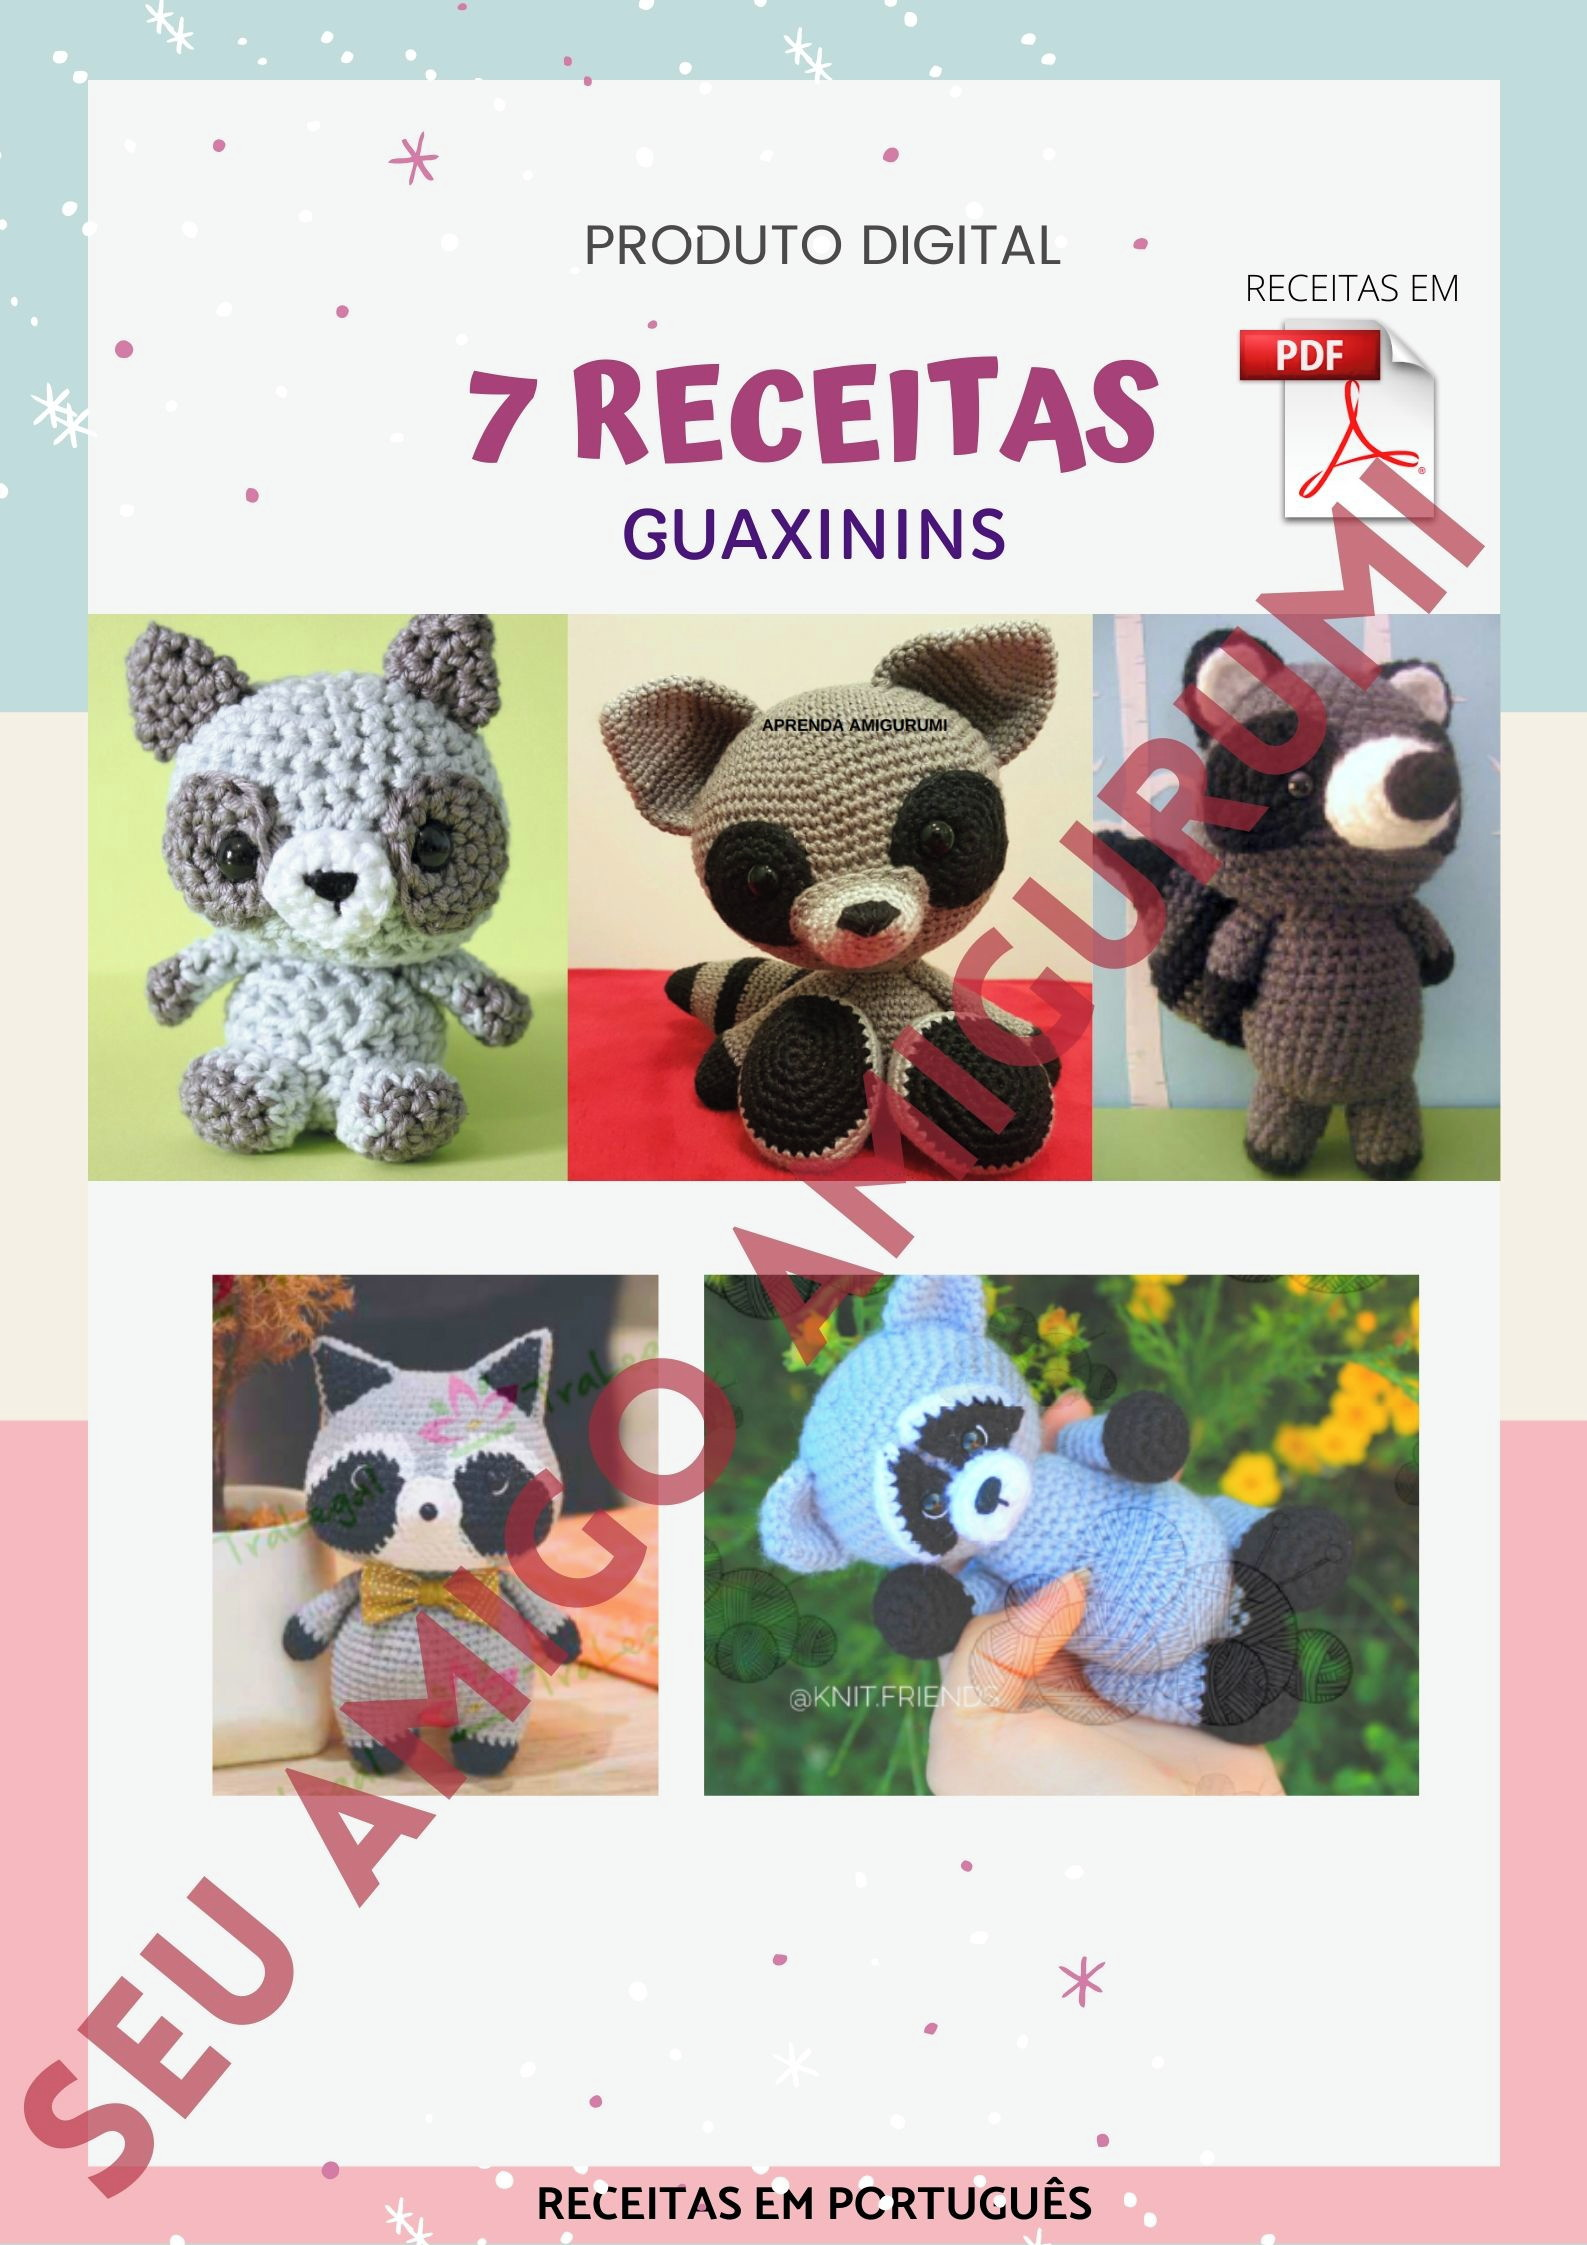 Amigurumi Crochet How to Make Amigurumi Doll – Amigurumi Recipes ...   2245x1587